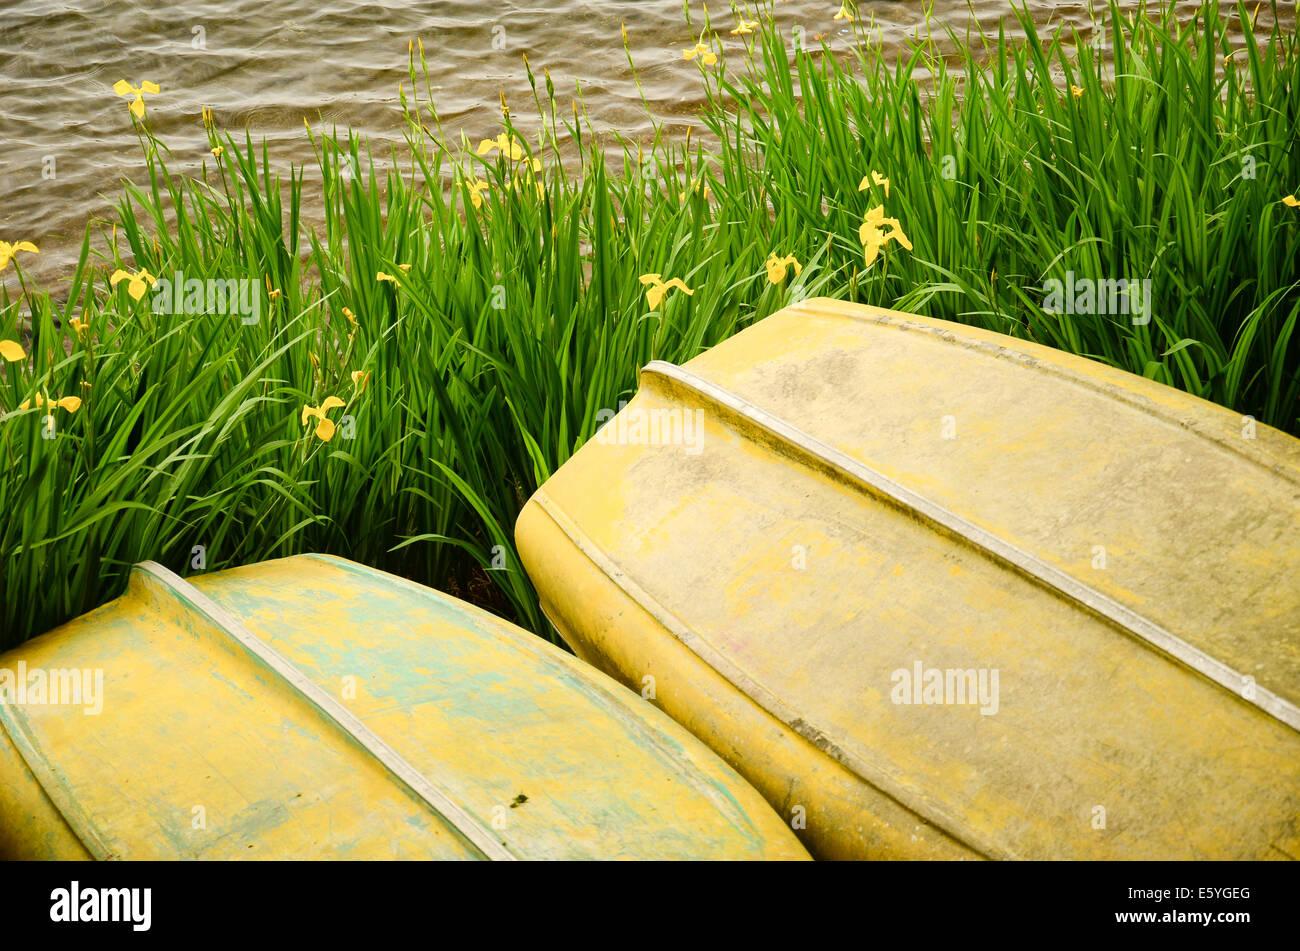 Small yellow boats in Lake Ashinoko at Hakone, Ashigarashimo District, Kanagawa Prefecture, Japan. - Stock Image